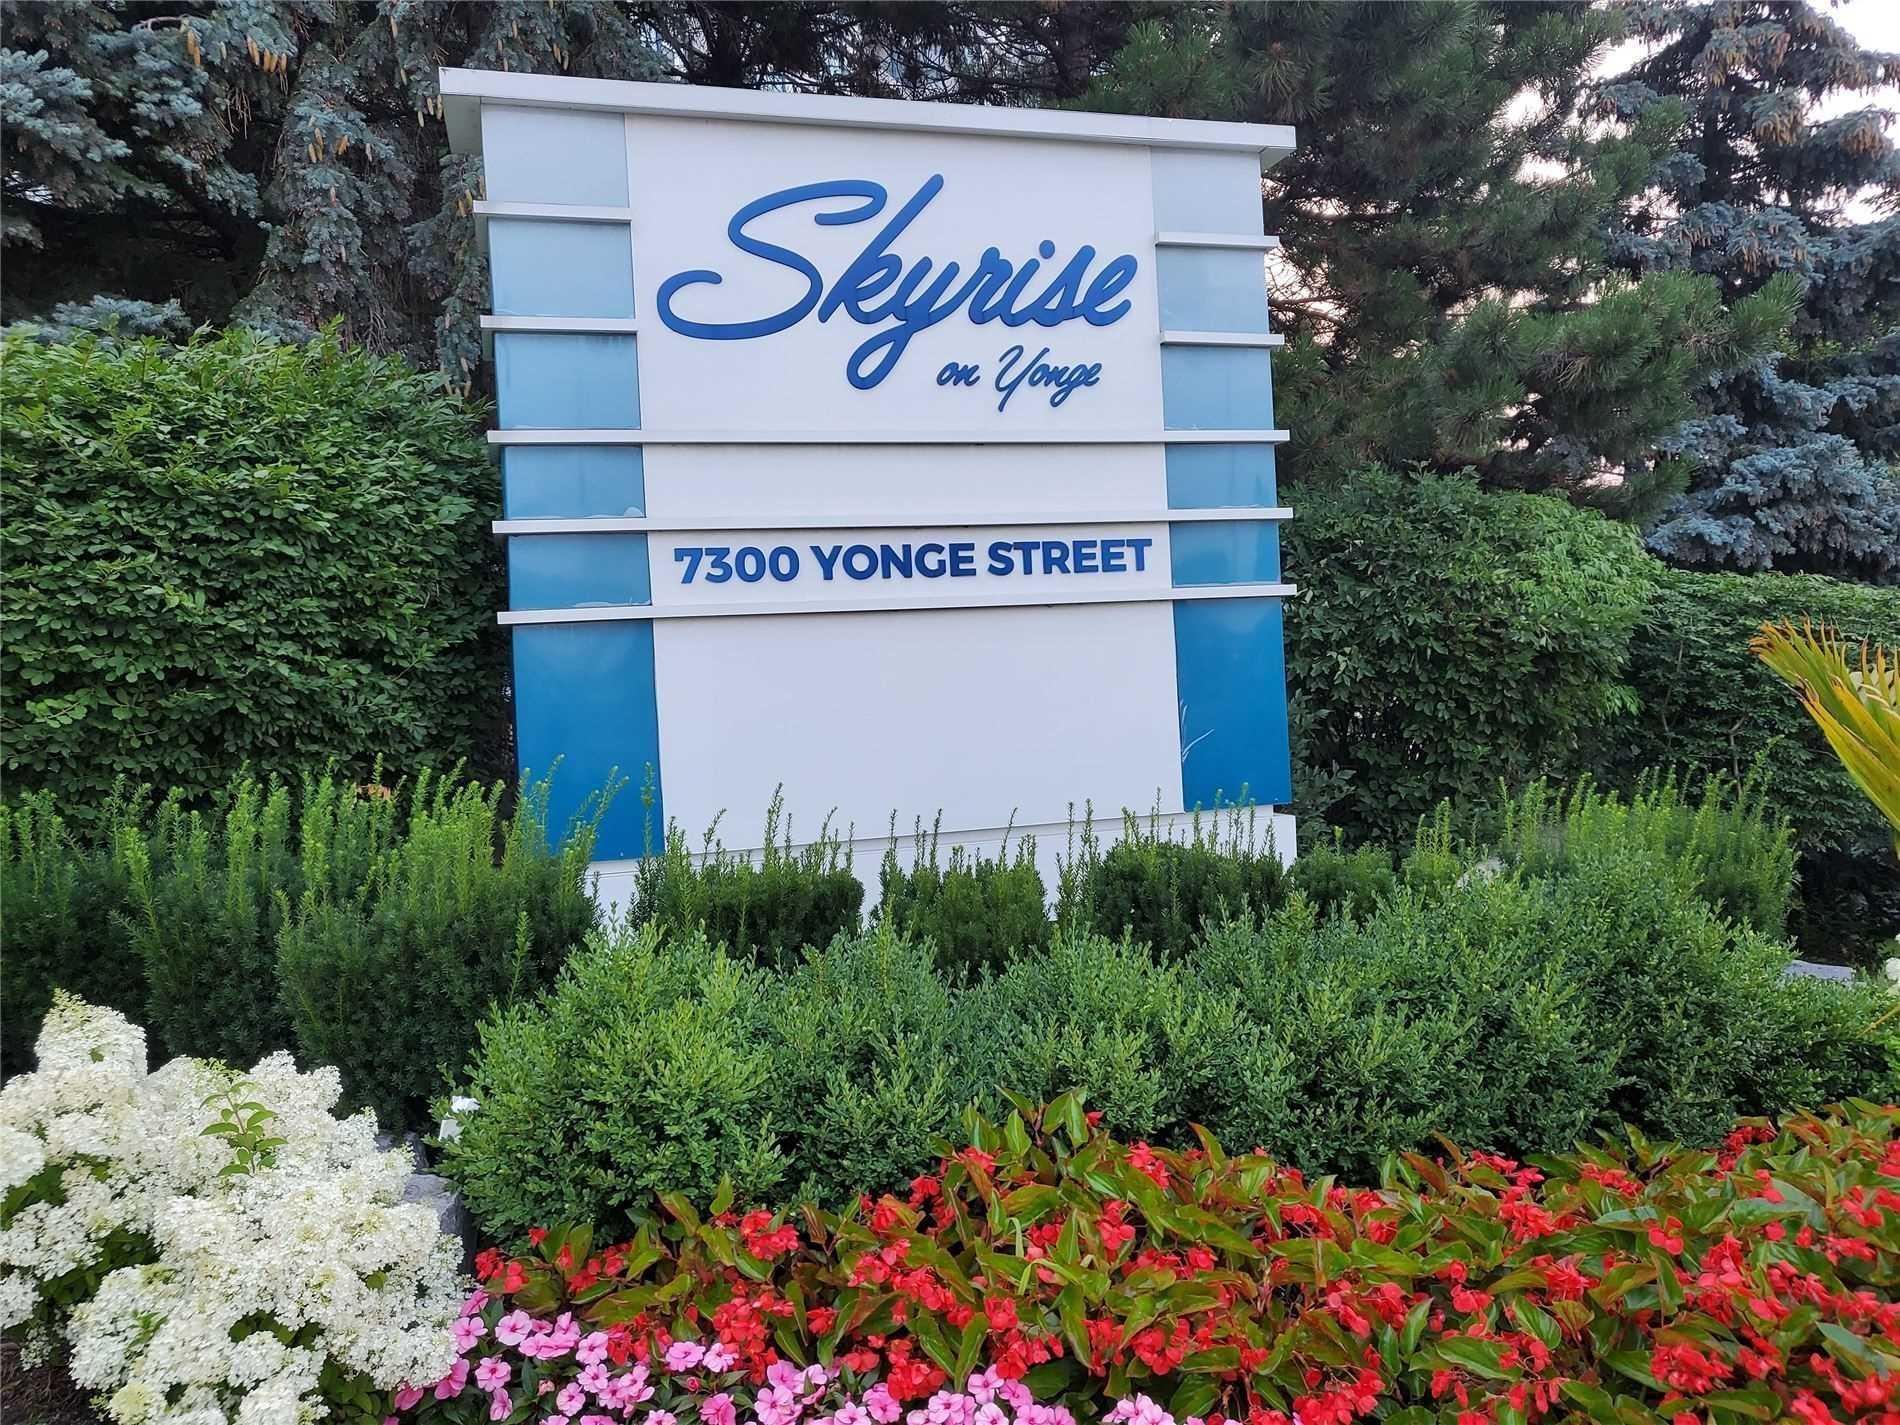 7300 Yonge St, Vaughan